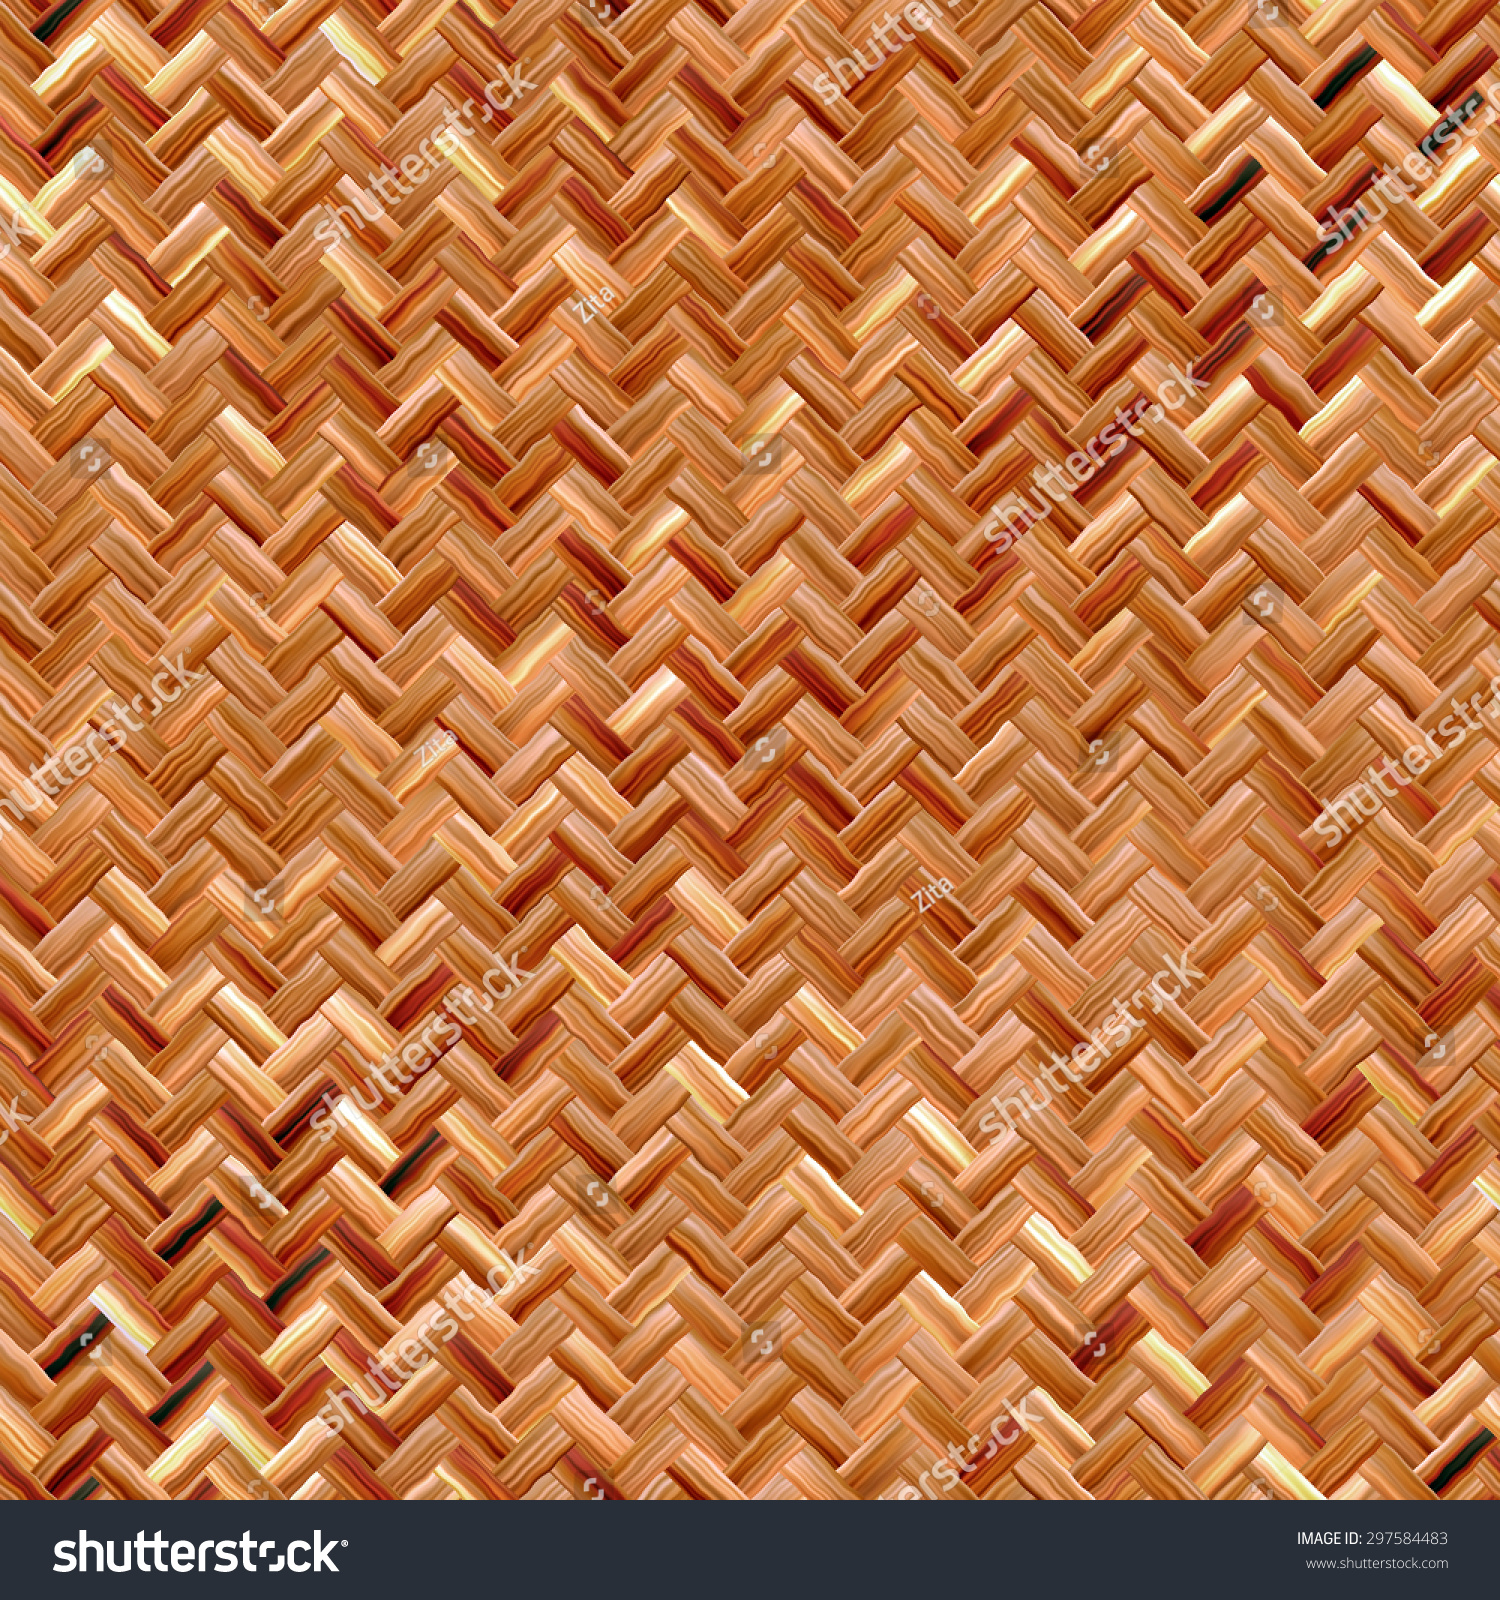 Basket weave brick pattern - Seamless Basket Weave Pattern